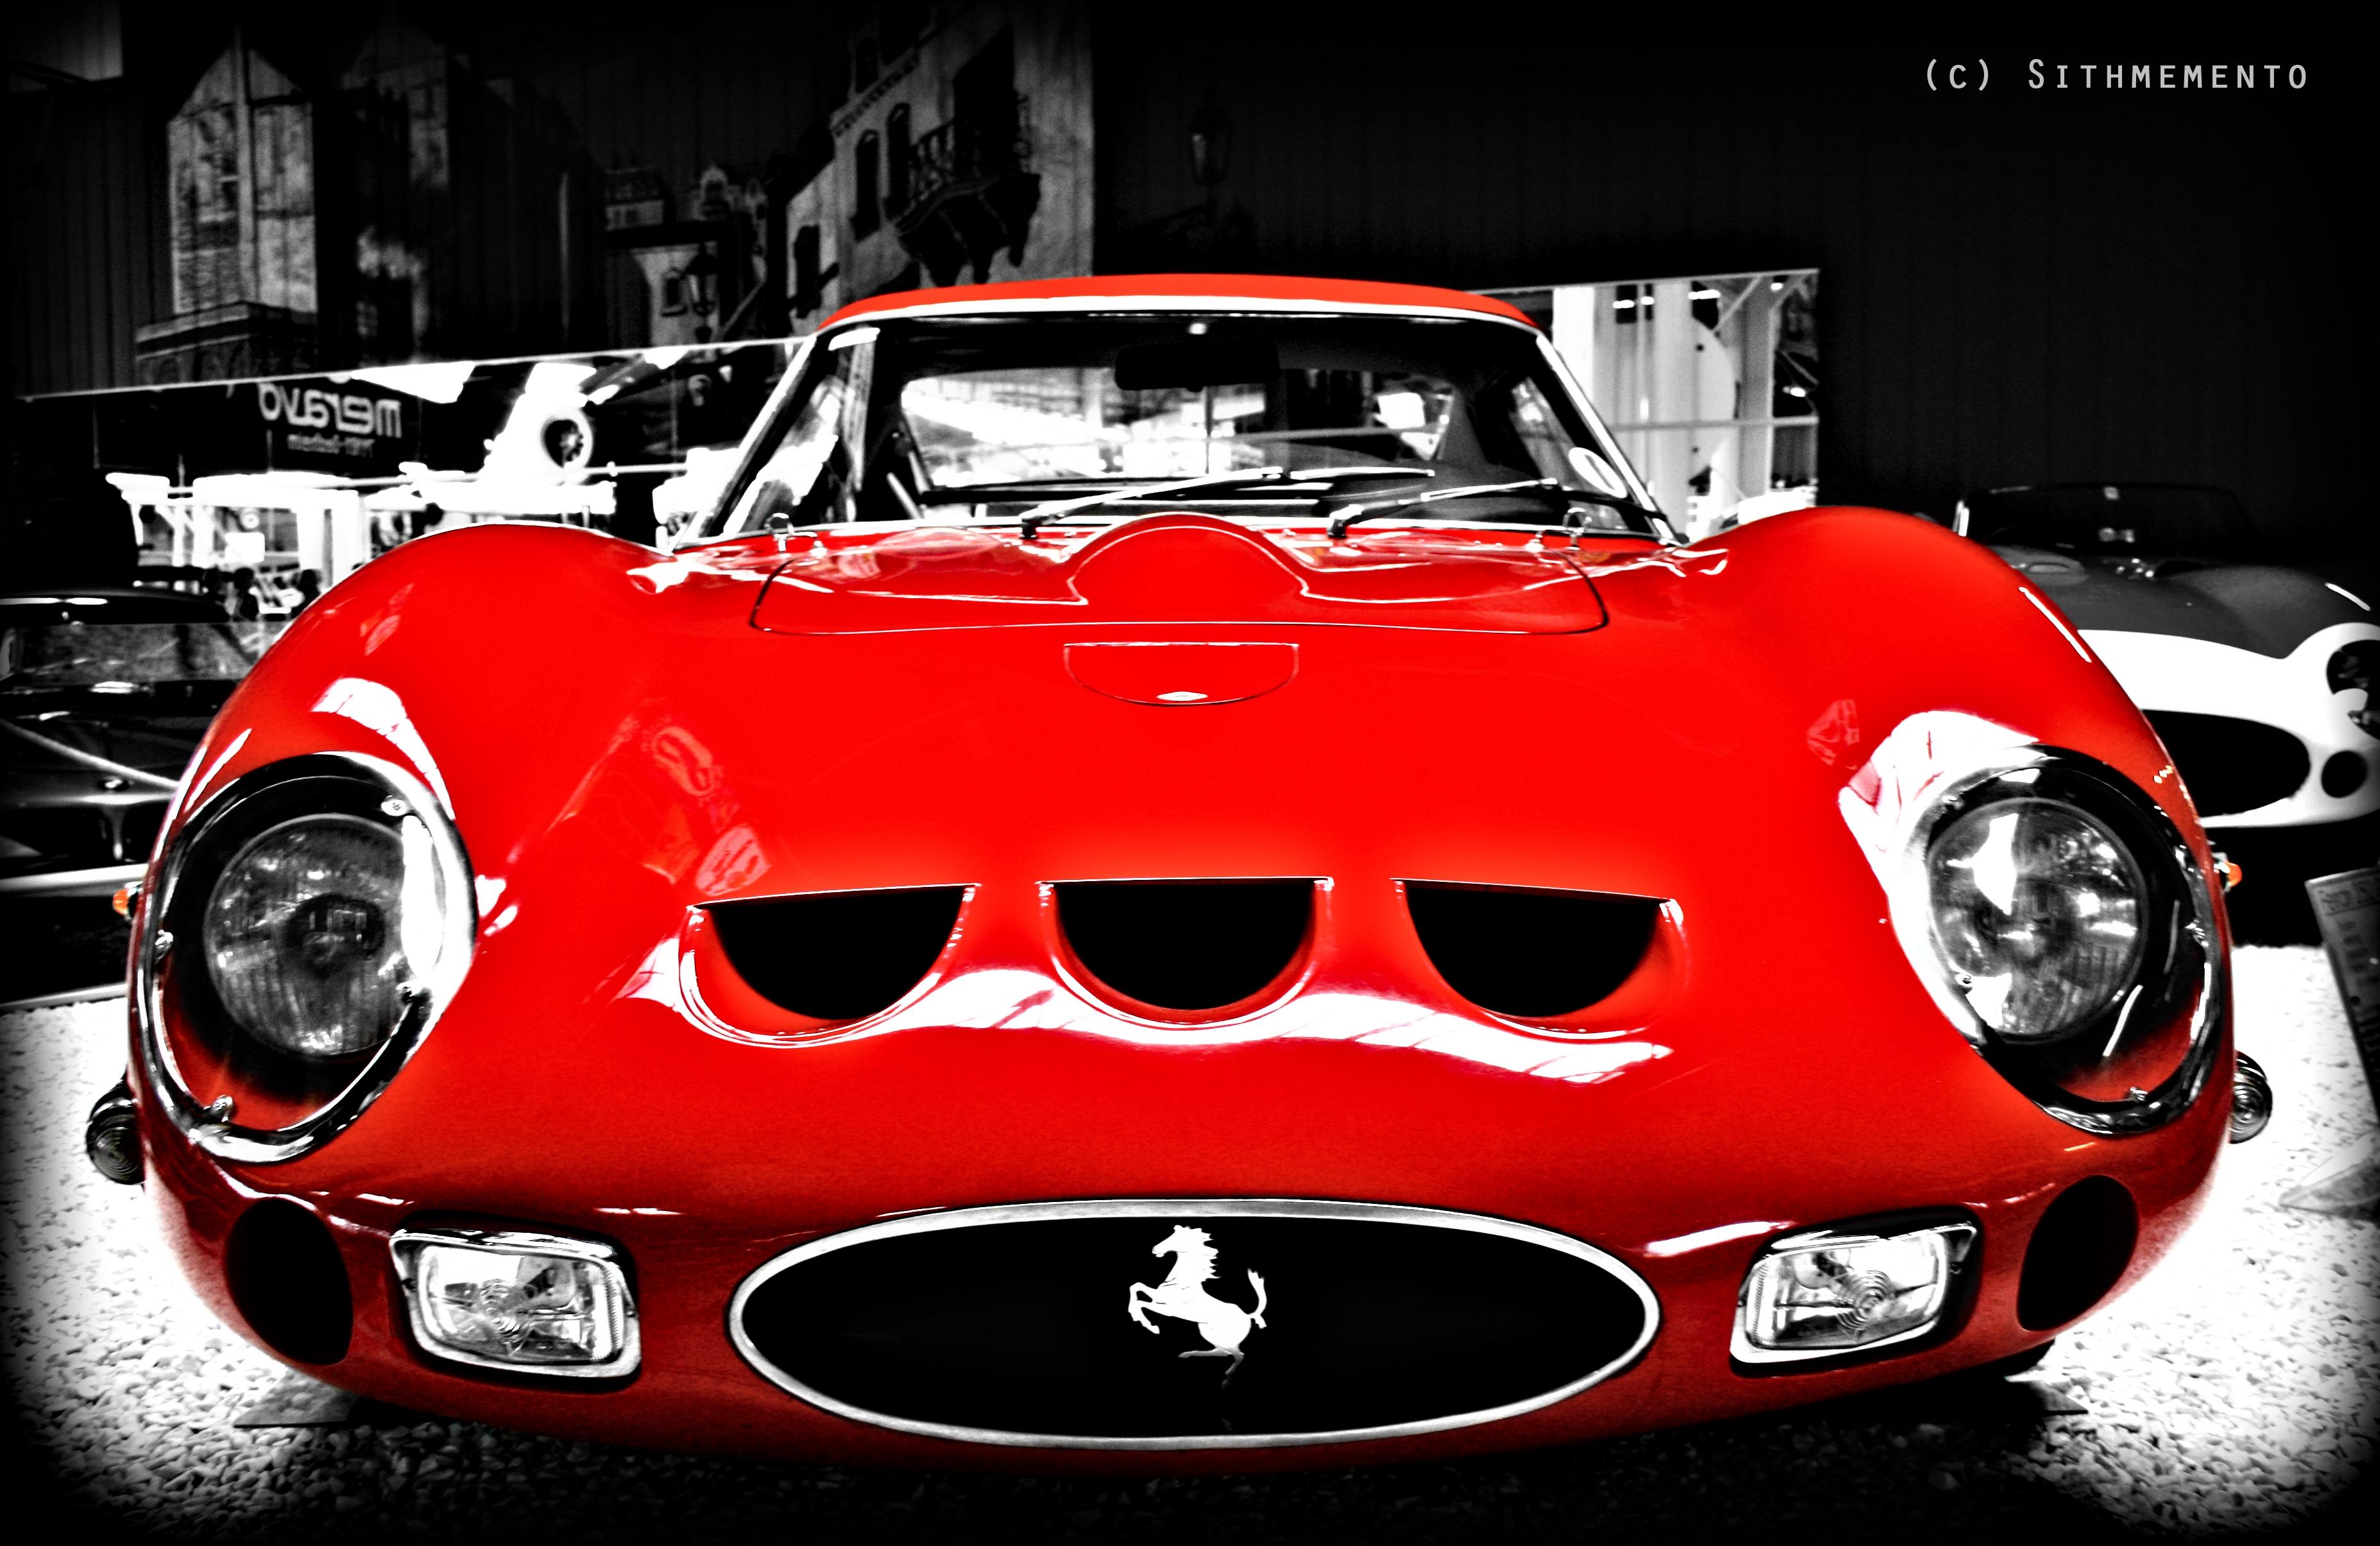 ferrari 250 GTO Wallpaper 15   3709 X 2409 stmednet 3709x2409